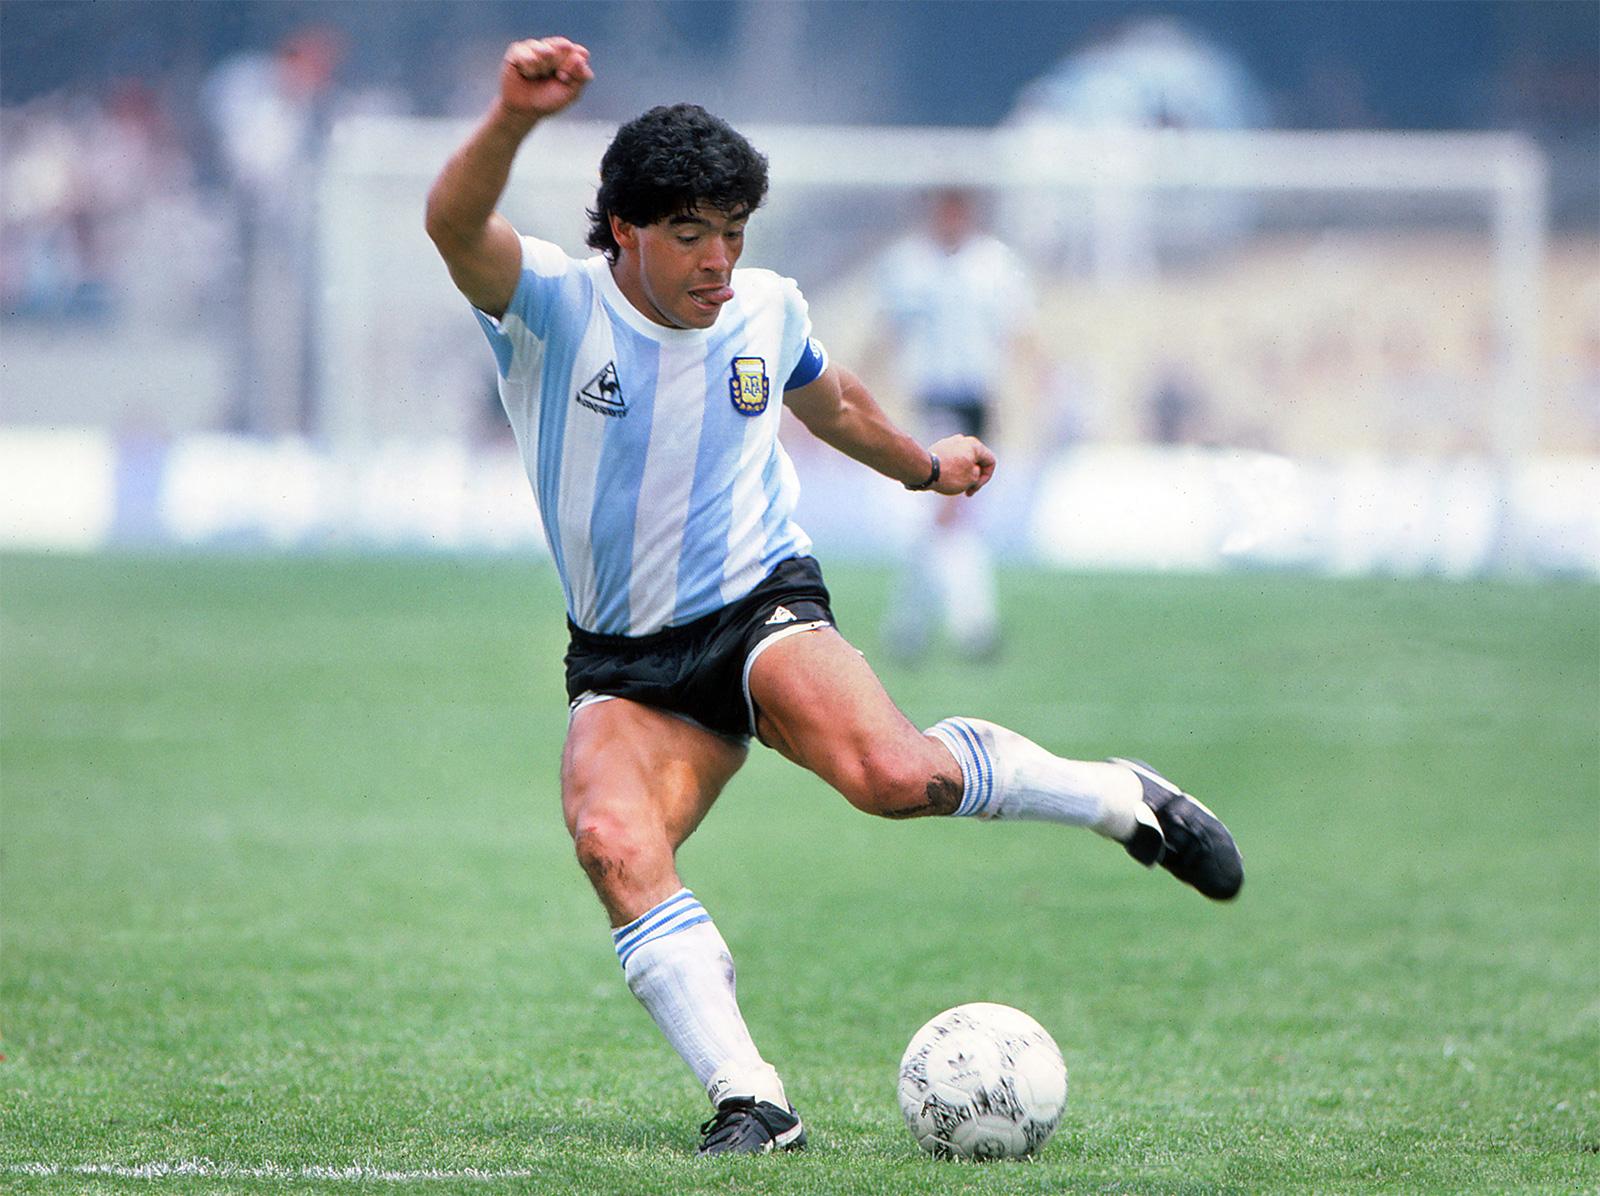 Maradona öldü mü? | Diego Armando Maradona neden öldü?| Maradona kimdir?